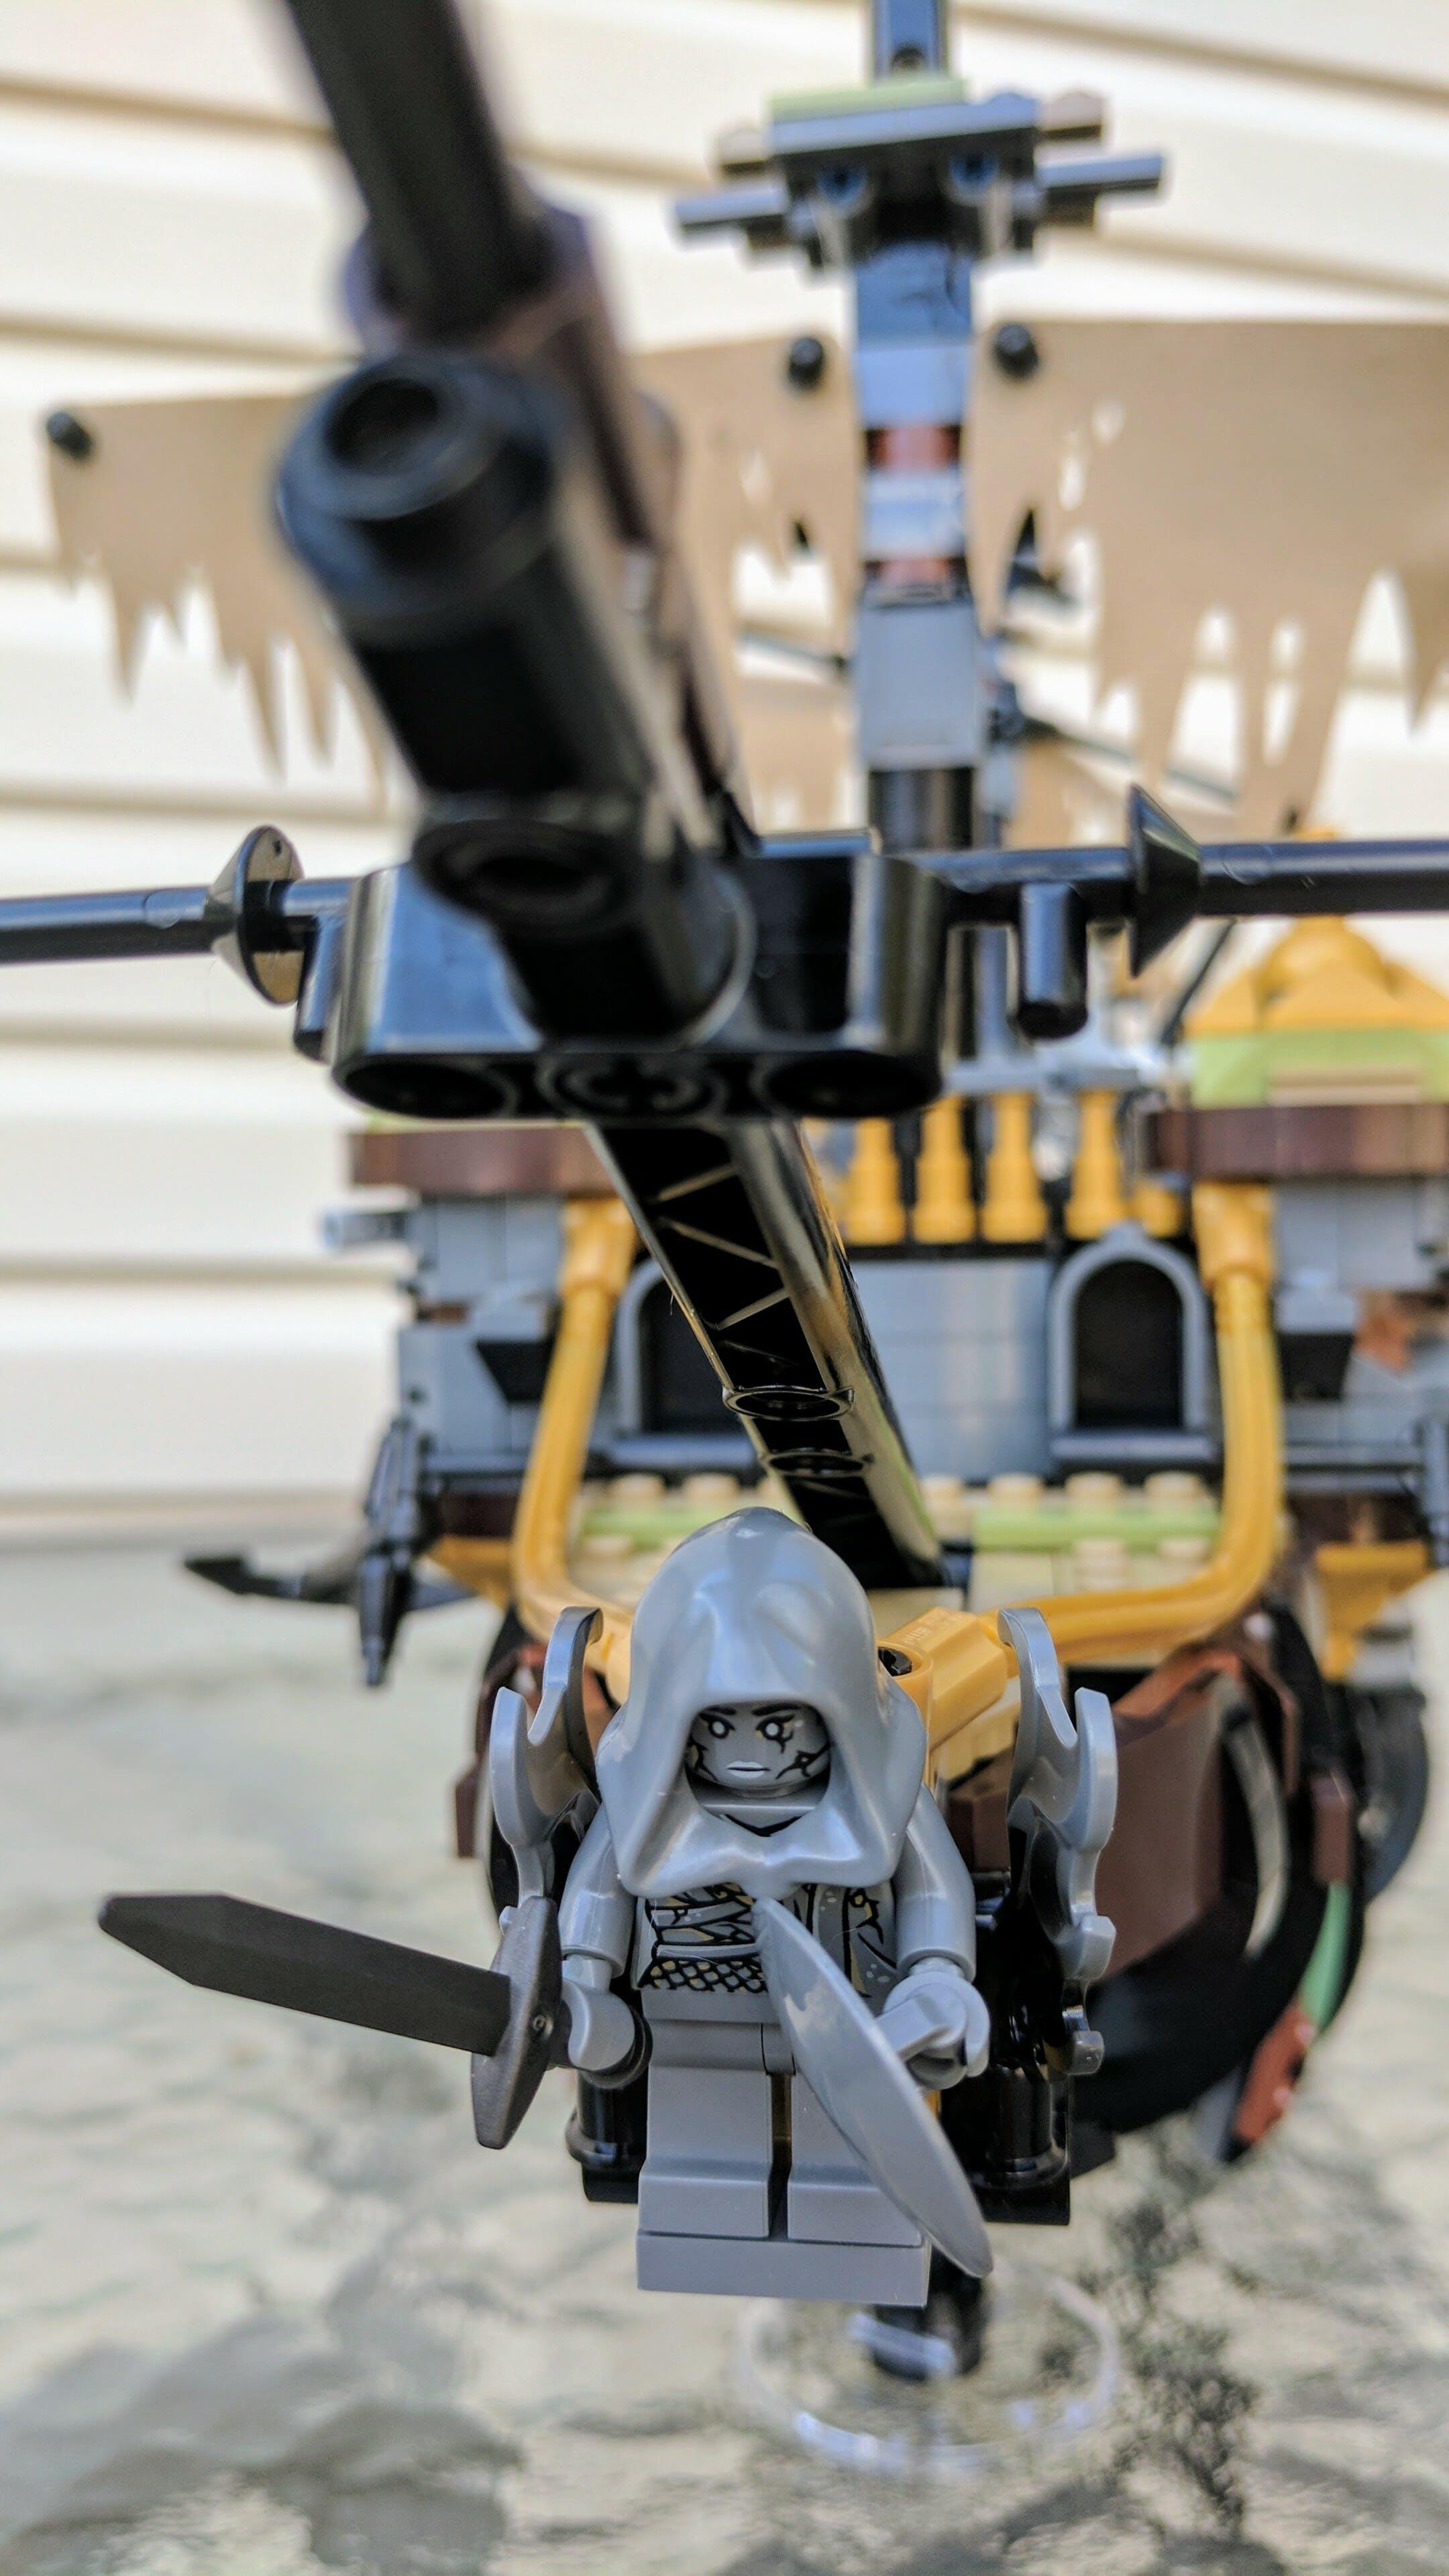 lego pirate ship